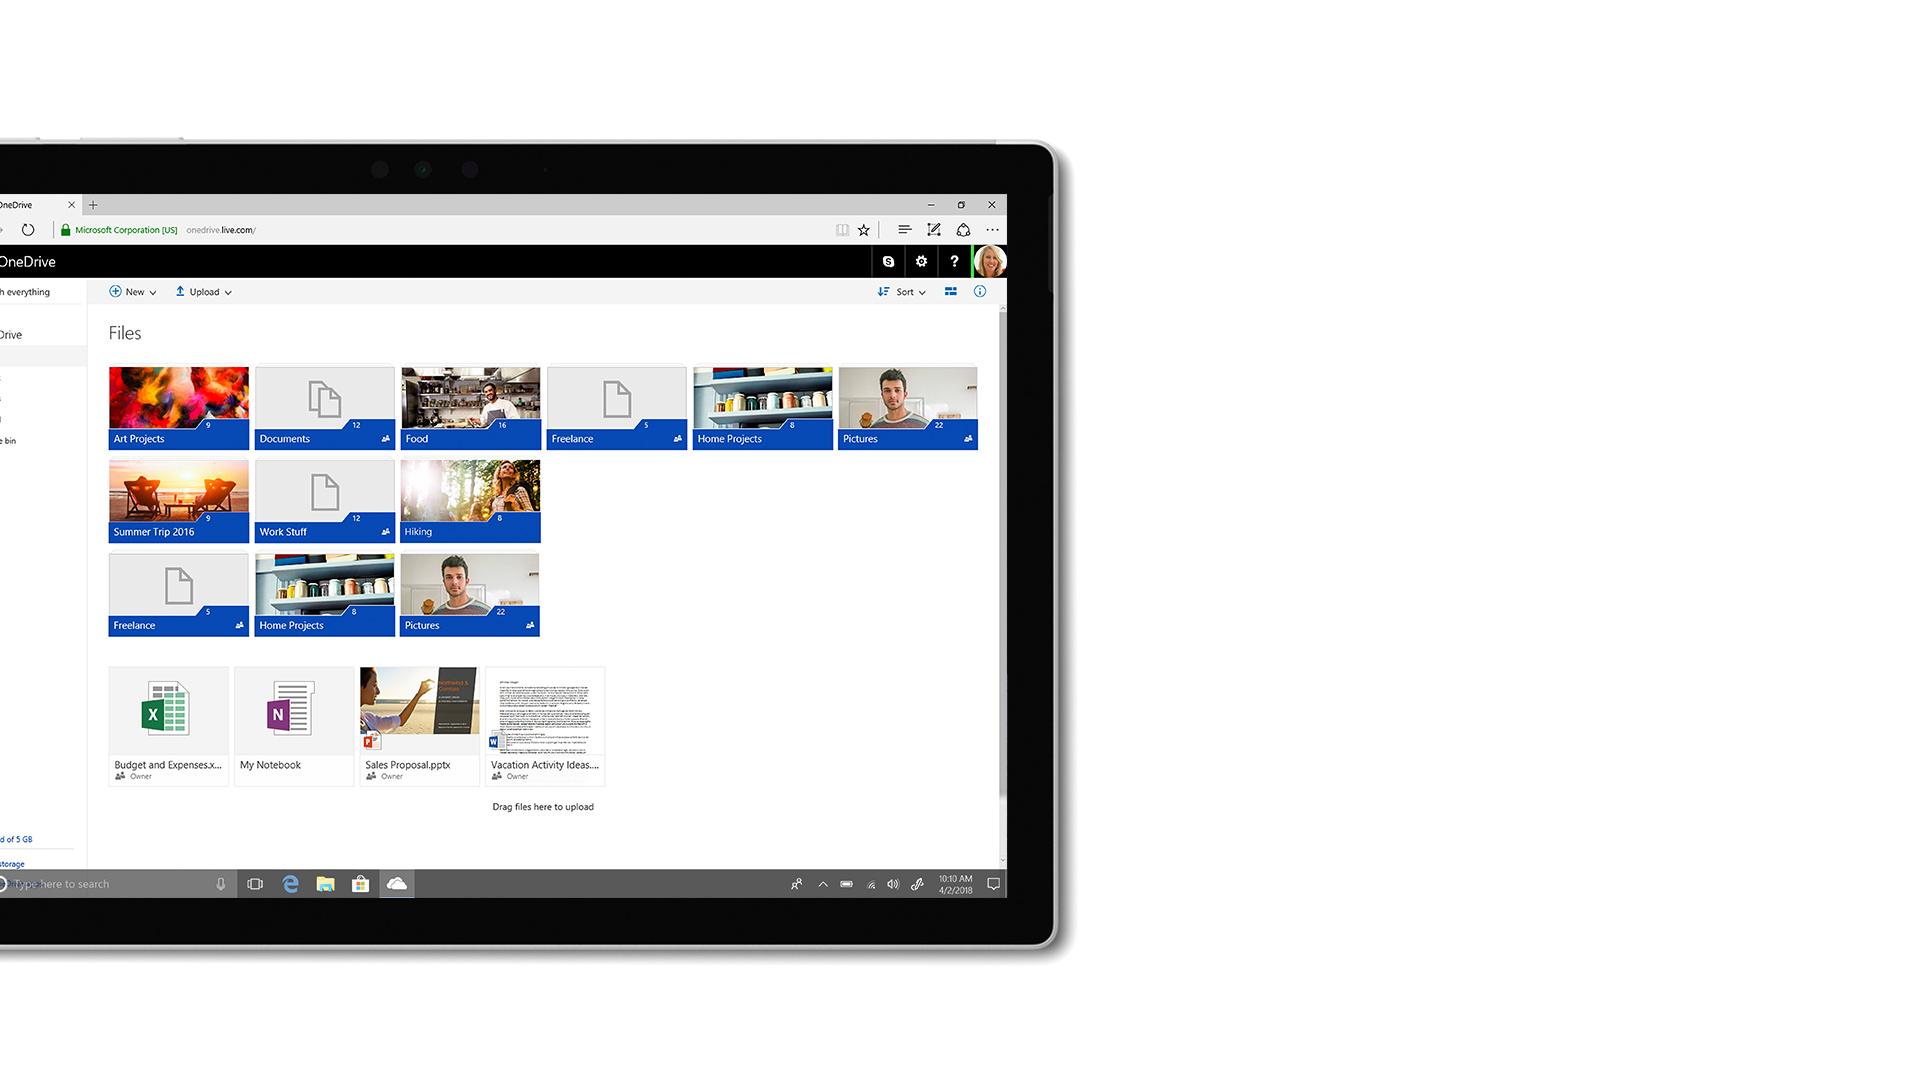 Microsoft OneDrive 用户界面的图像